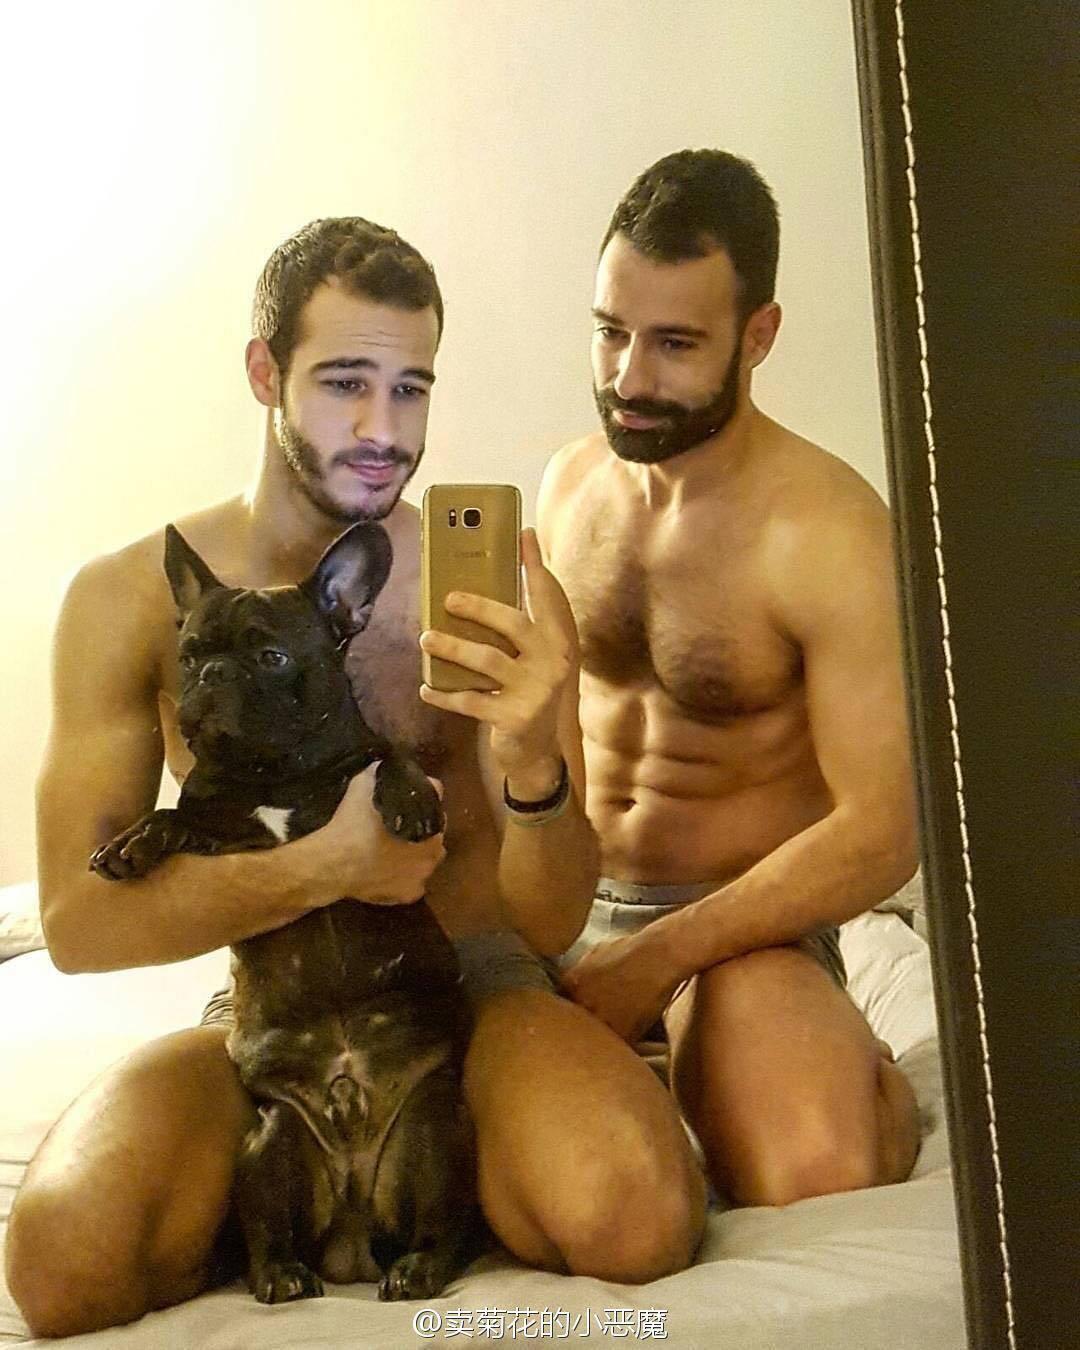 gay hot daddy dude men porn str8 sexting cruising